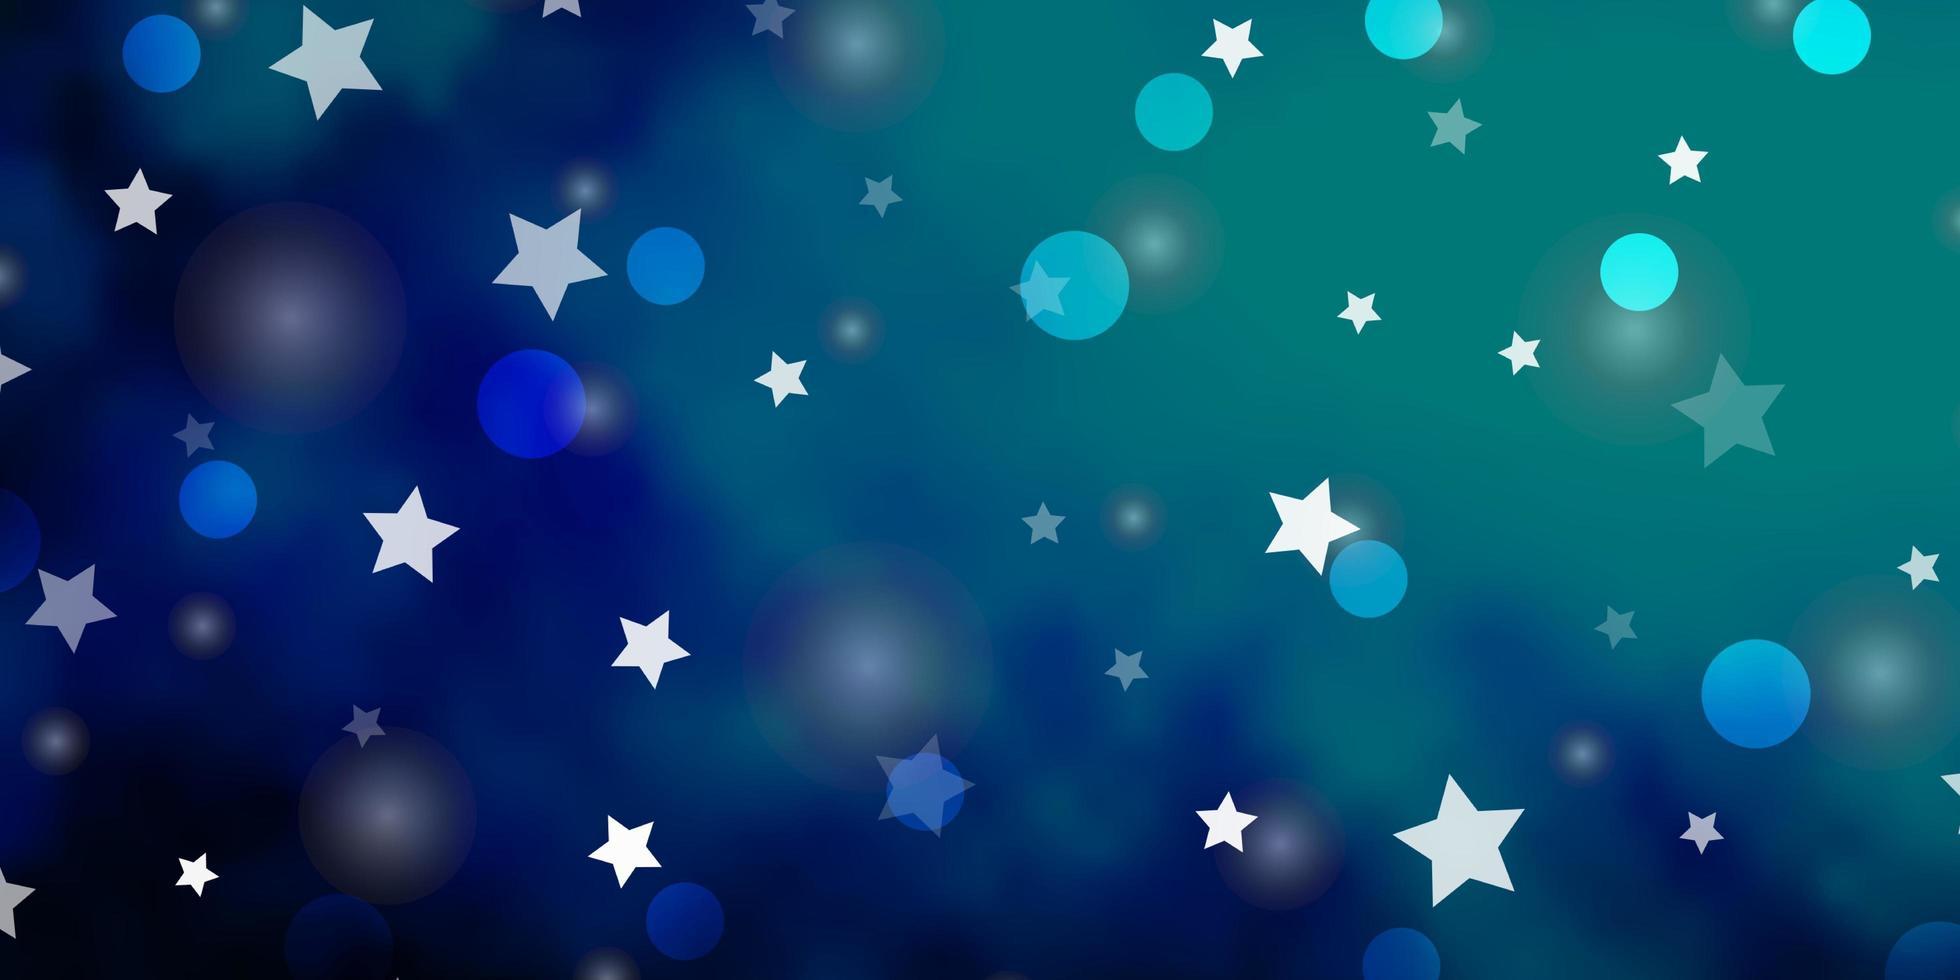 Dark BLUE vector texture with circles, stars.